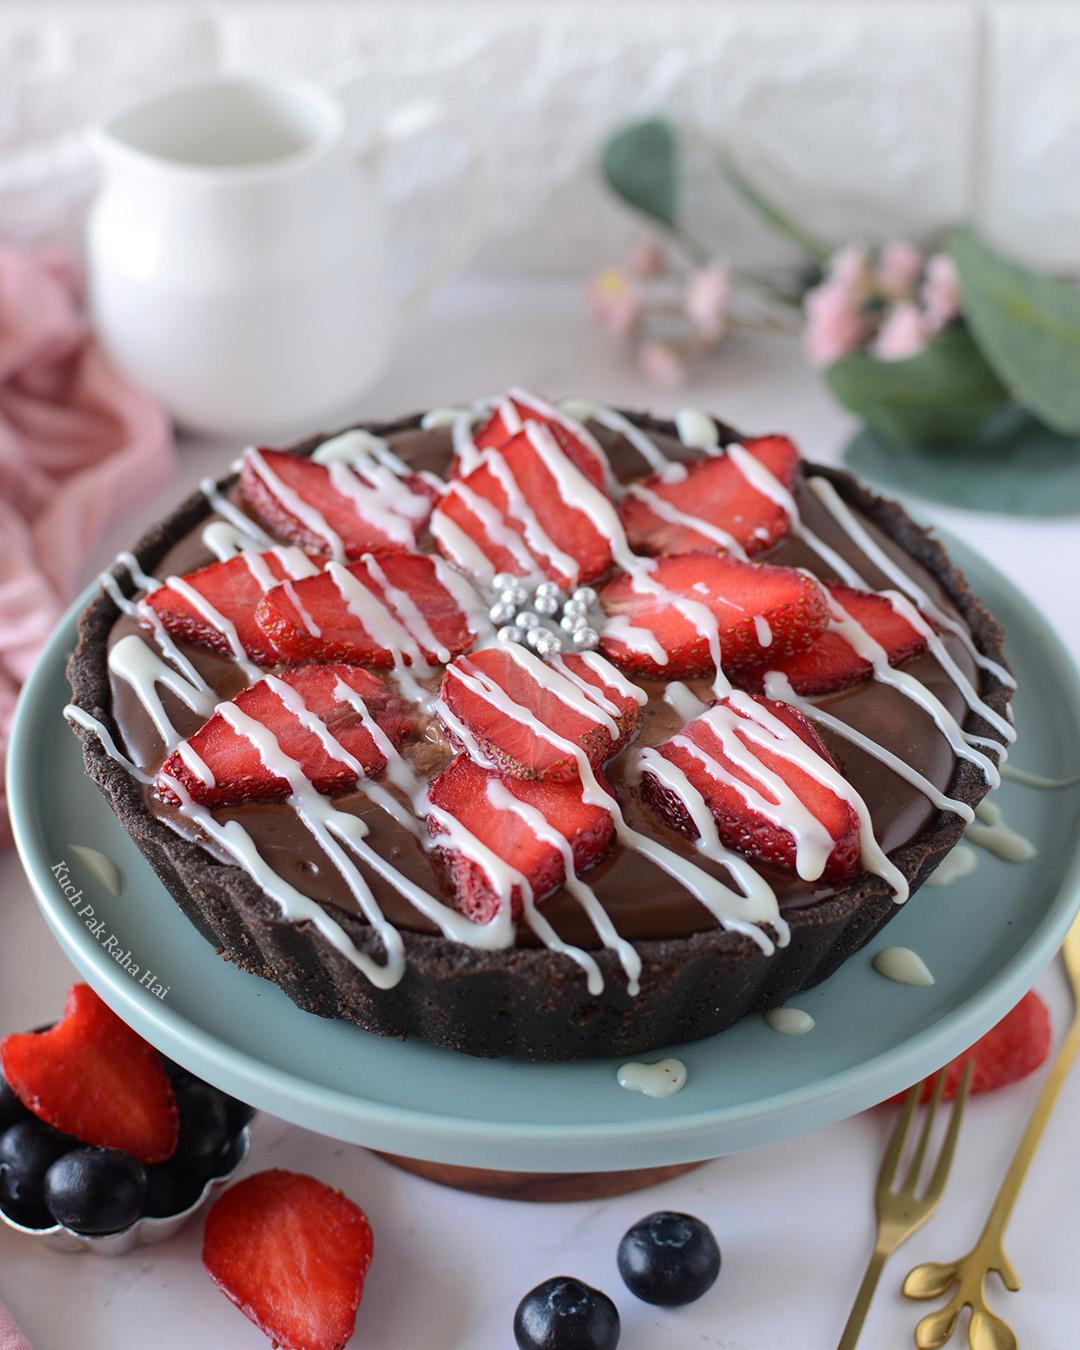 Egg free strawberry oreo chocolate tart no bake dessert recipe valentine day special